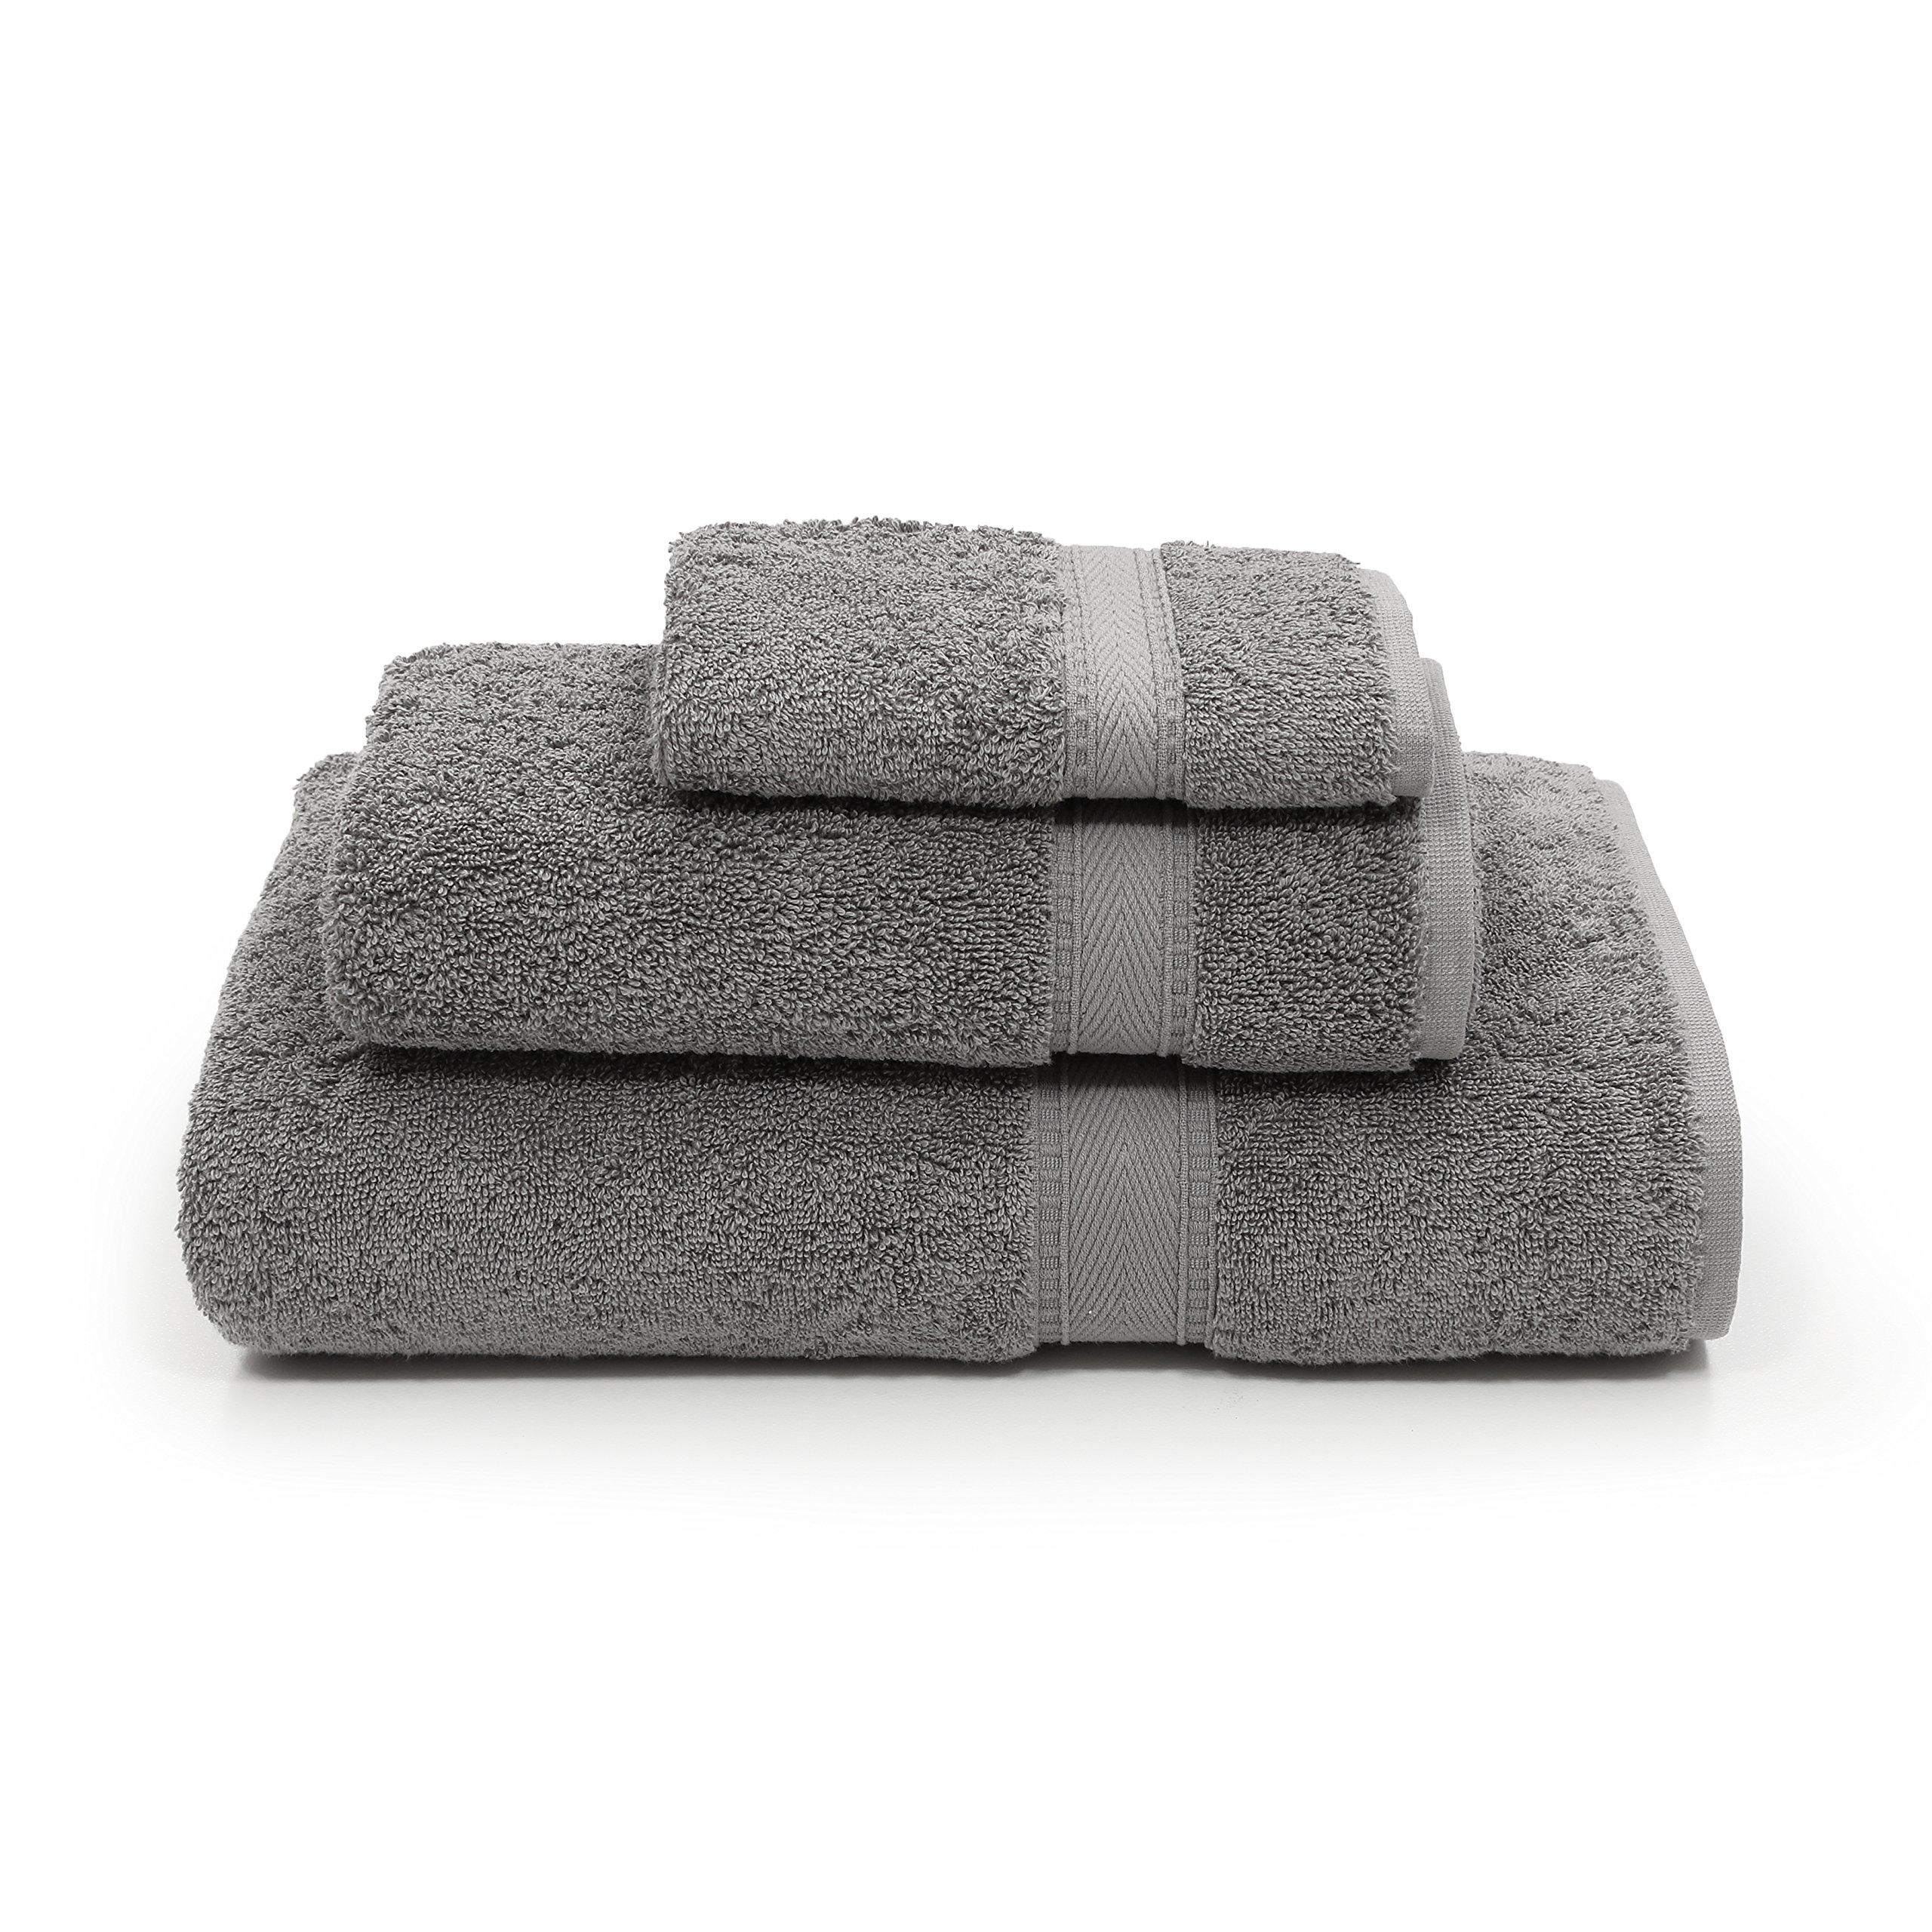 Linum Home Textiles SN96-3C Bath Towel, Dark Grey